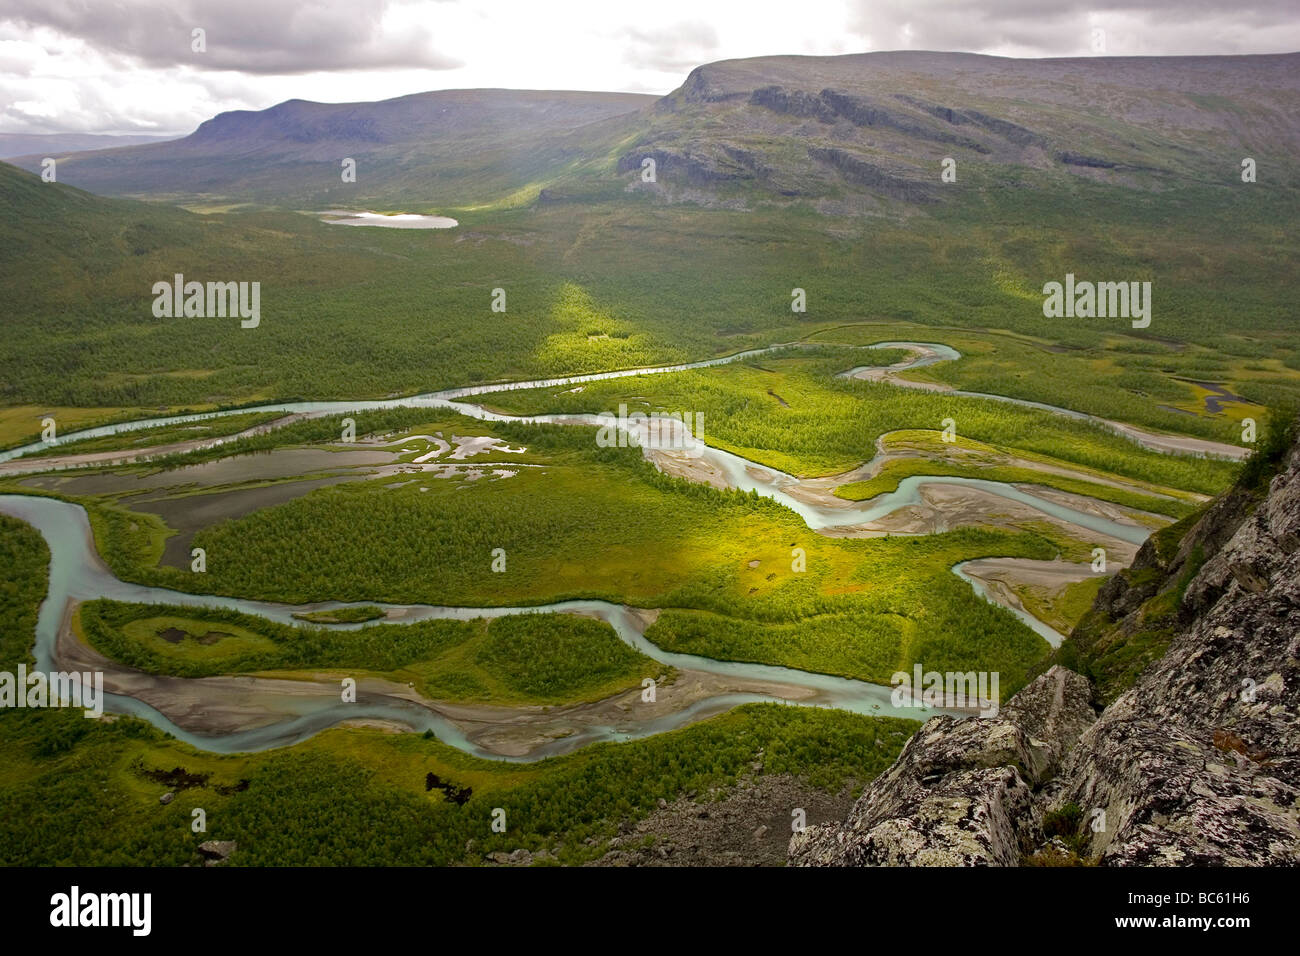 High angle view of river, Rapadalen, Sarek National Park, Jokkmokk Municipality, Lapland Province, Sweden Stock Photo